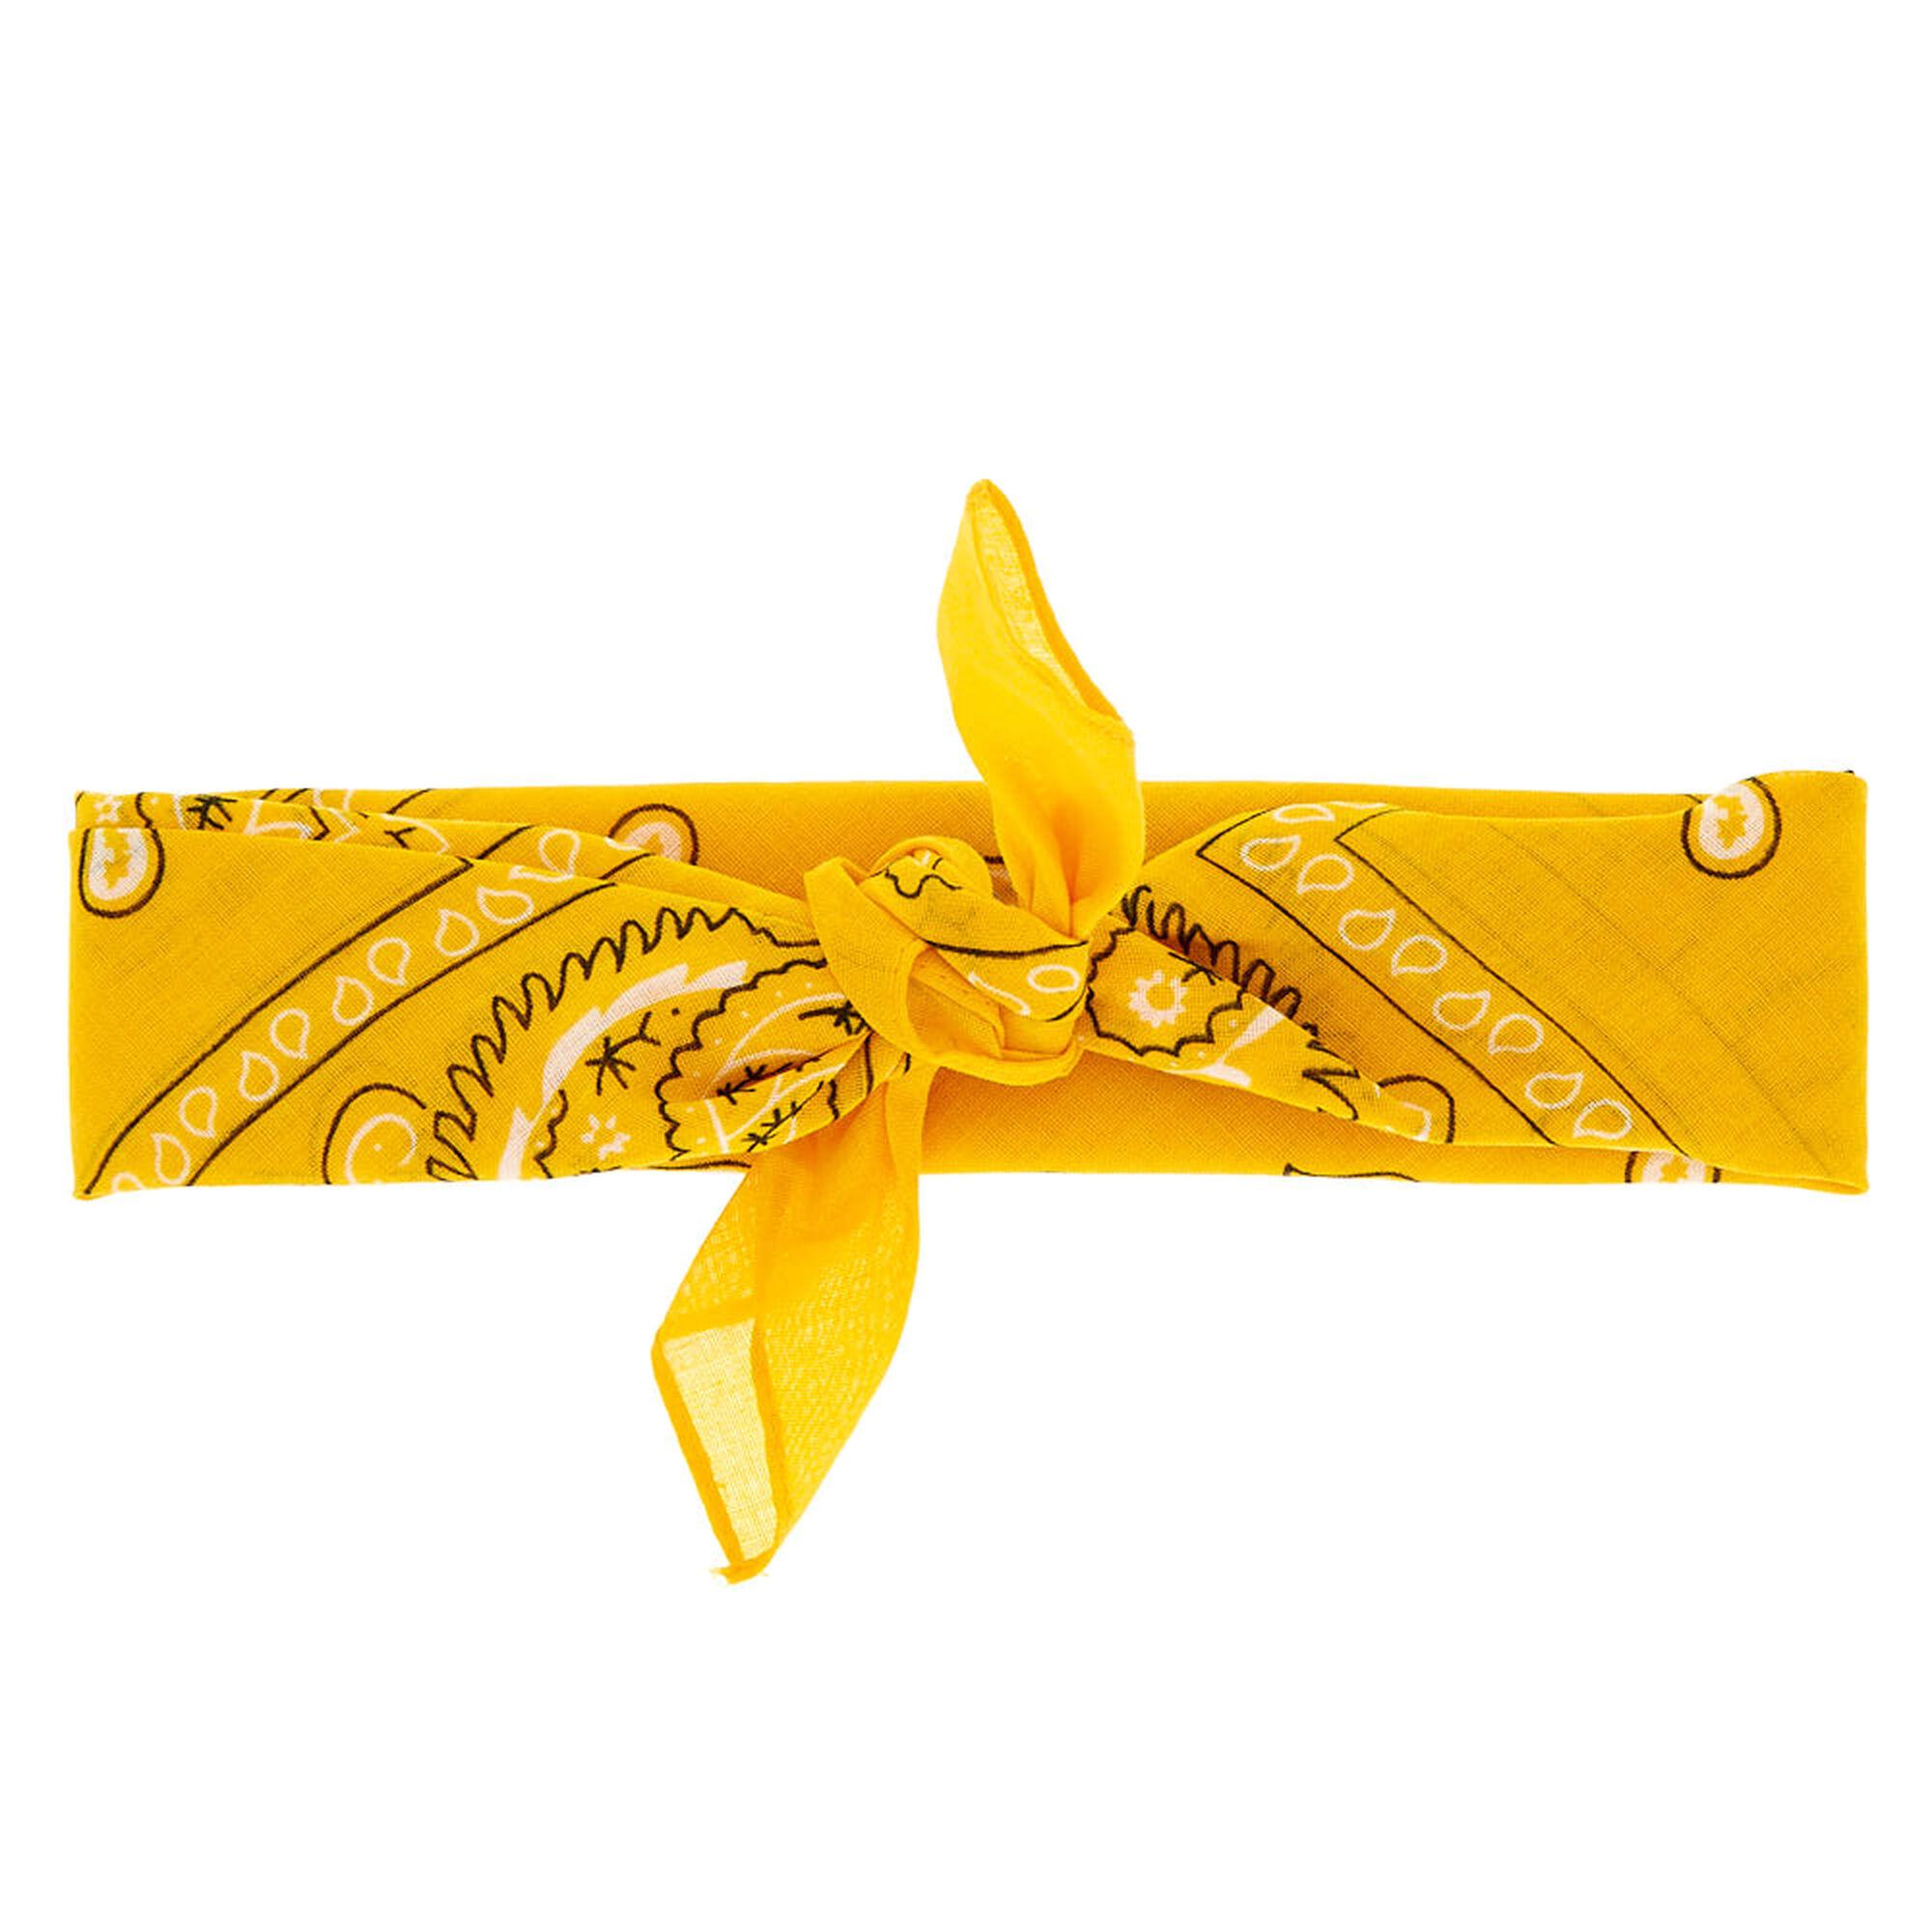 ... Paisley Print Bandana Headwrap - Mustard Yellow 822745fbb85